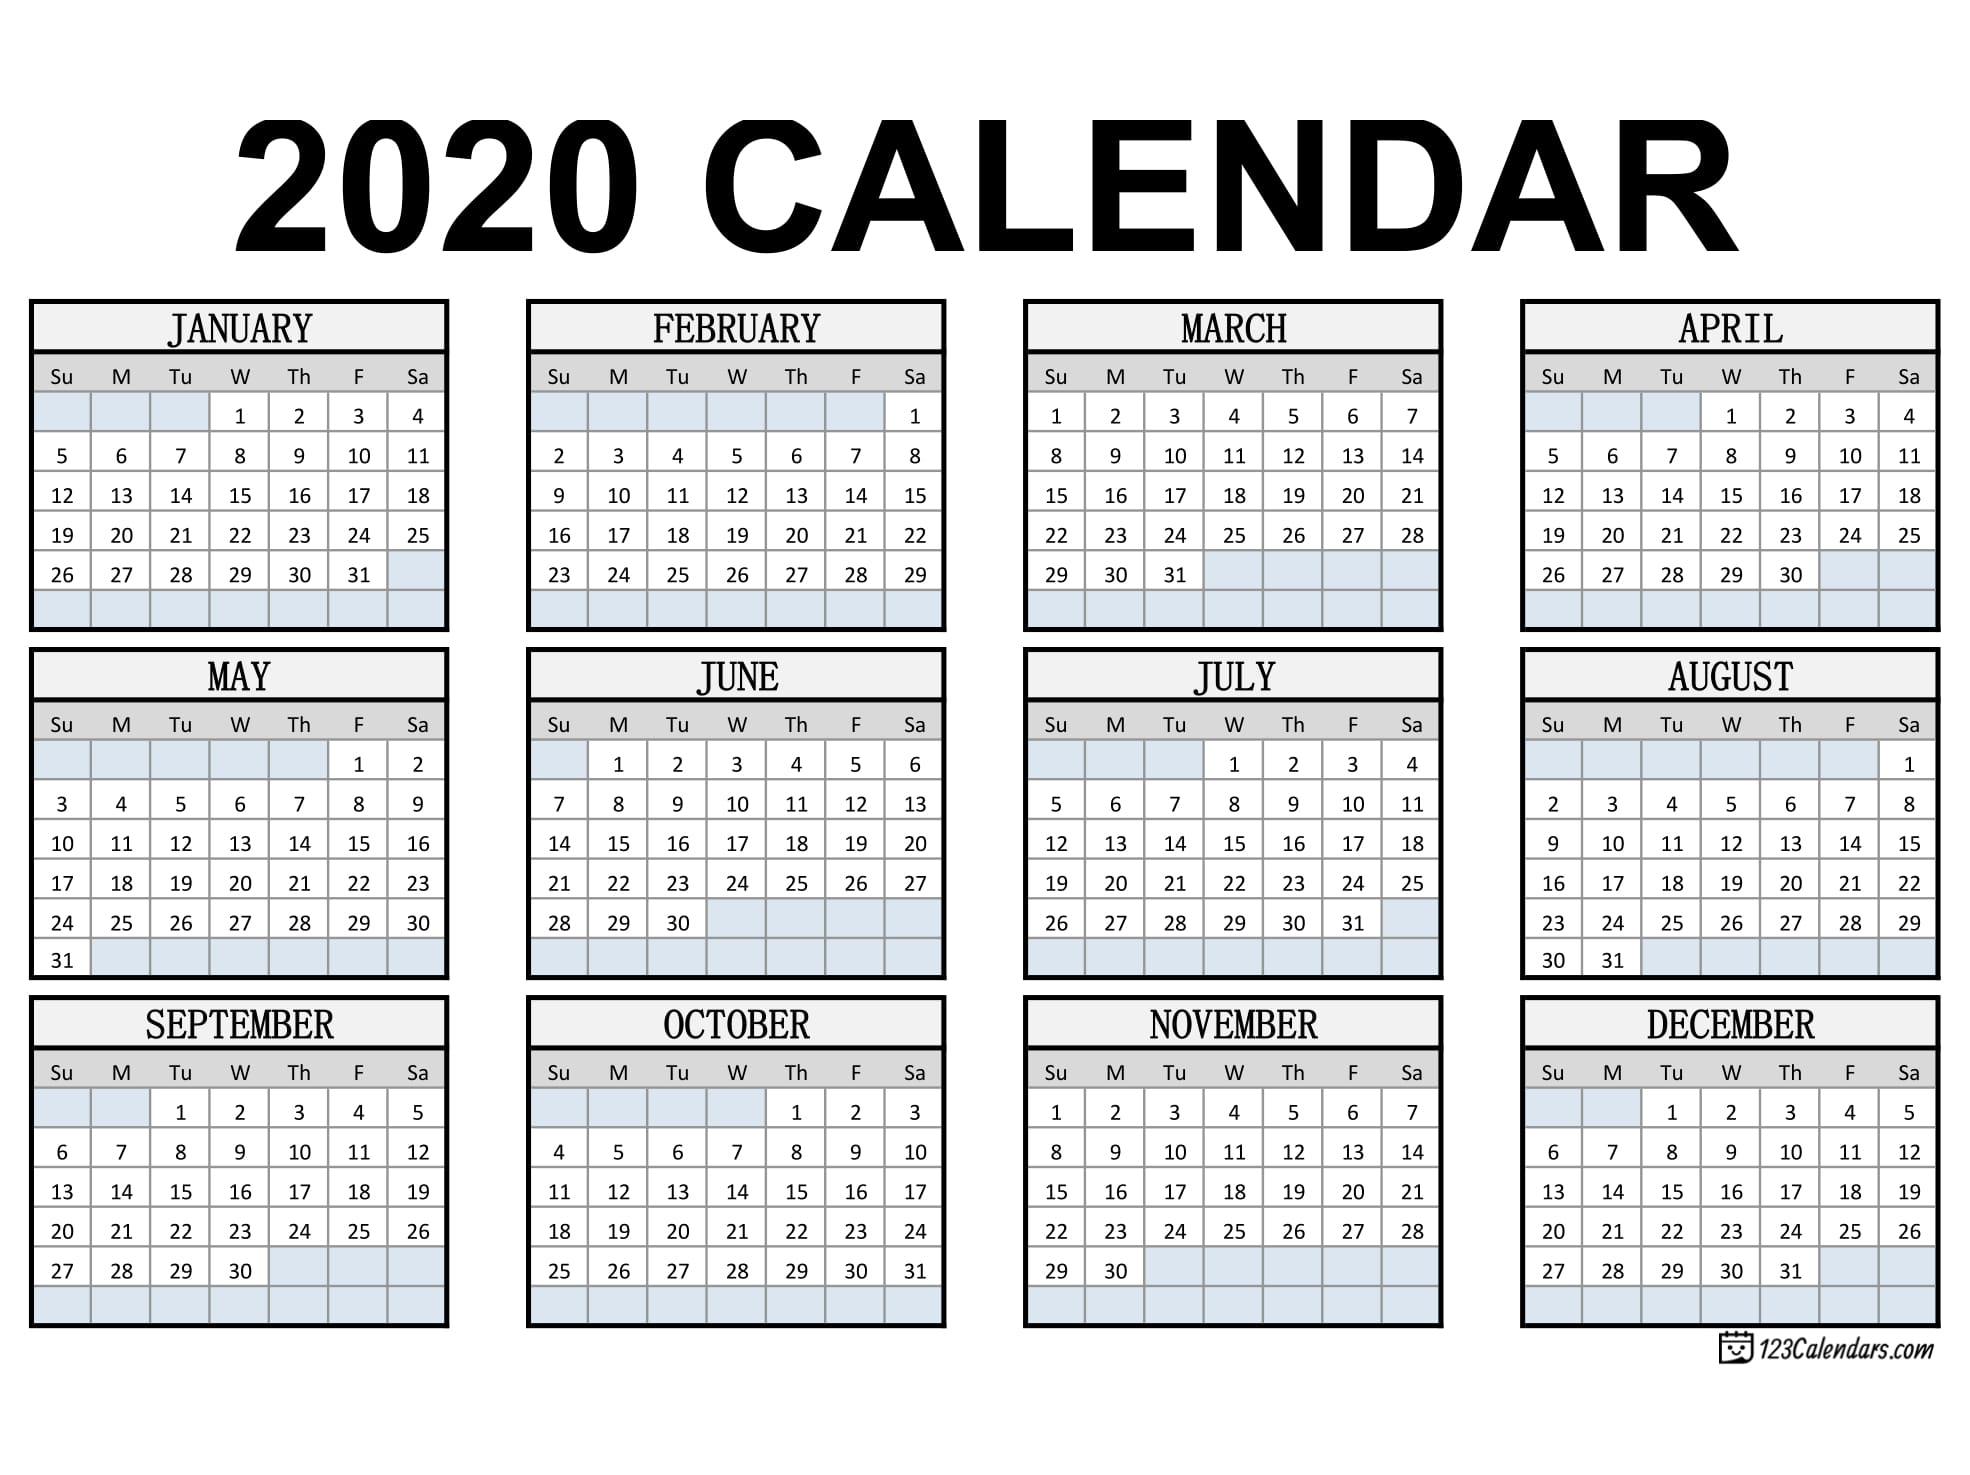 Free Printable 2020 Calendar | 123Calendars with Free Printable Pocket Calendar